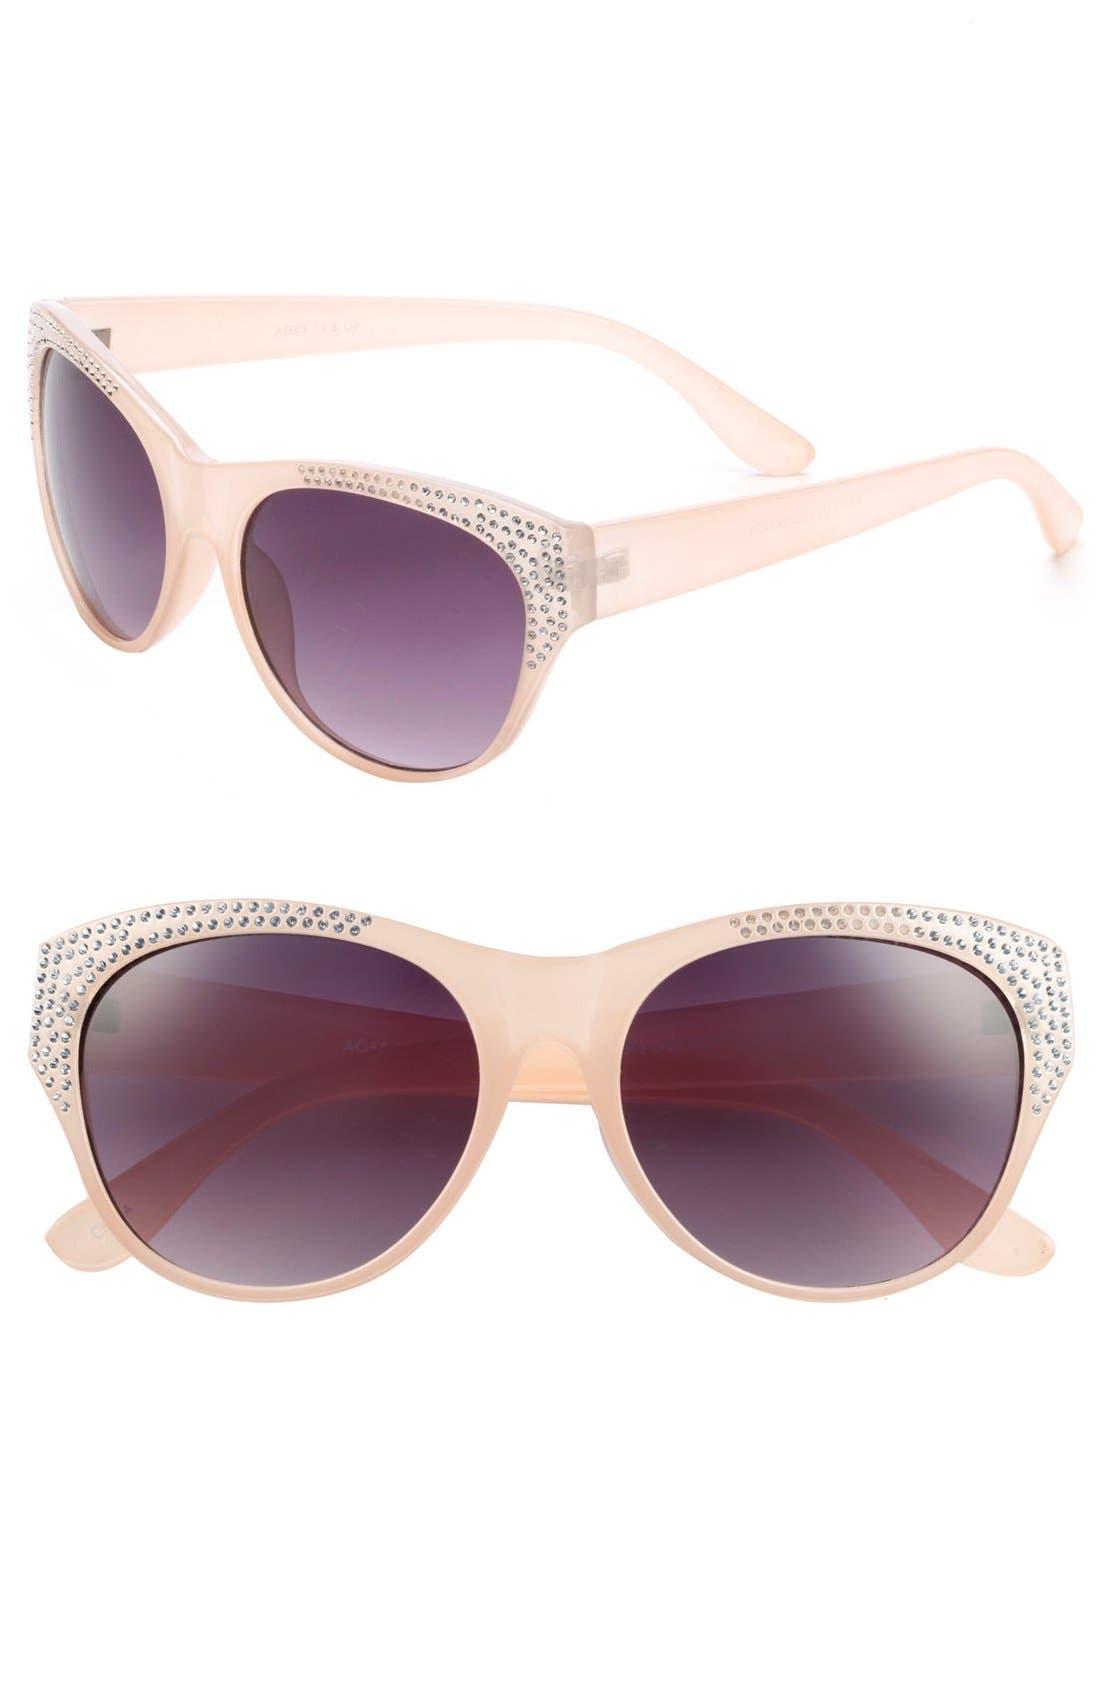 Main Image - Fantas Eyes Rhinestone Stud Sunglasses